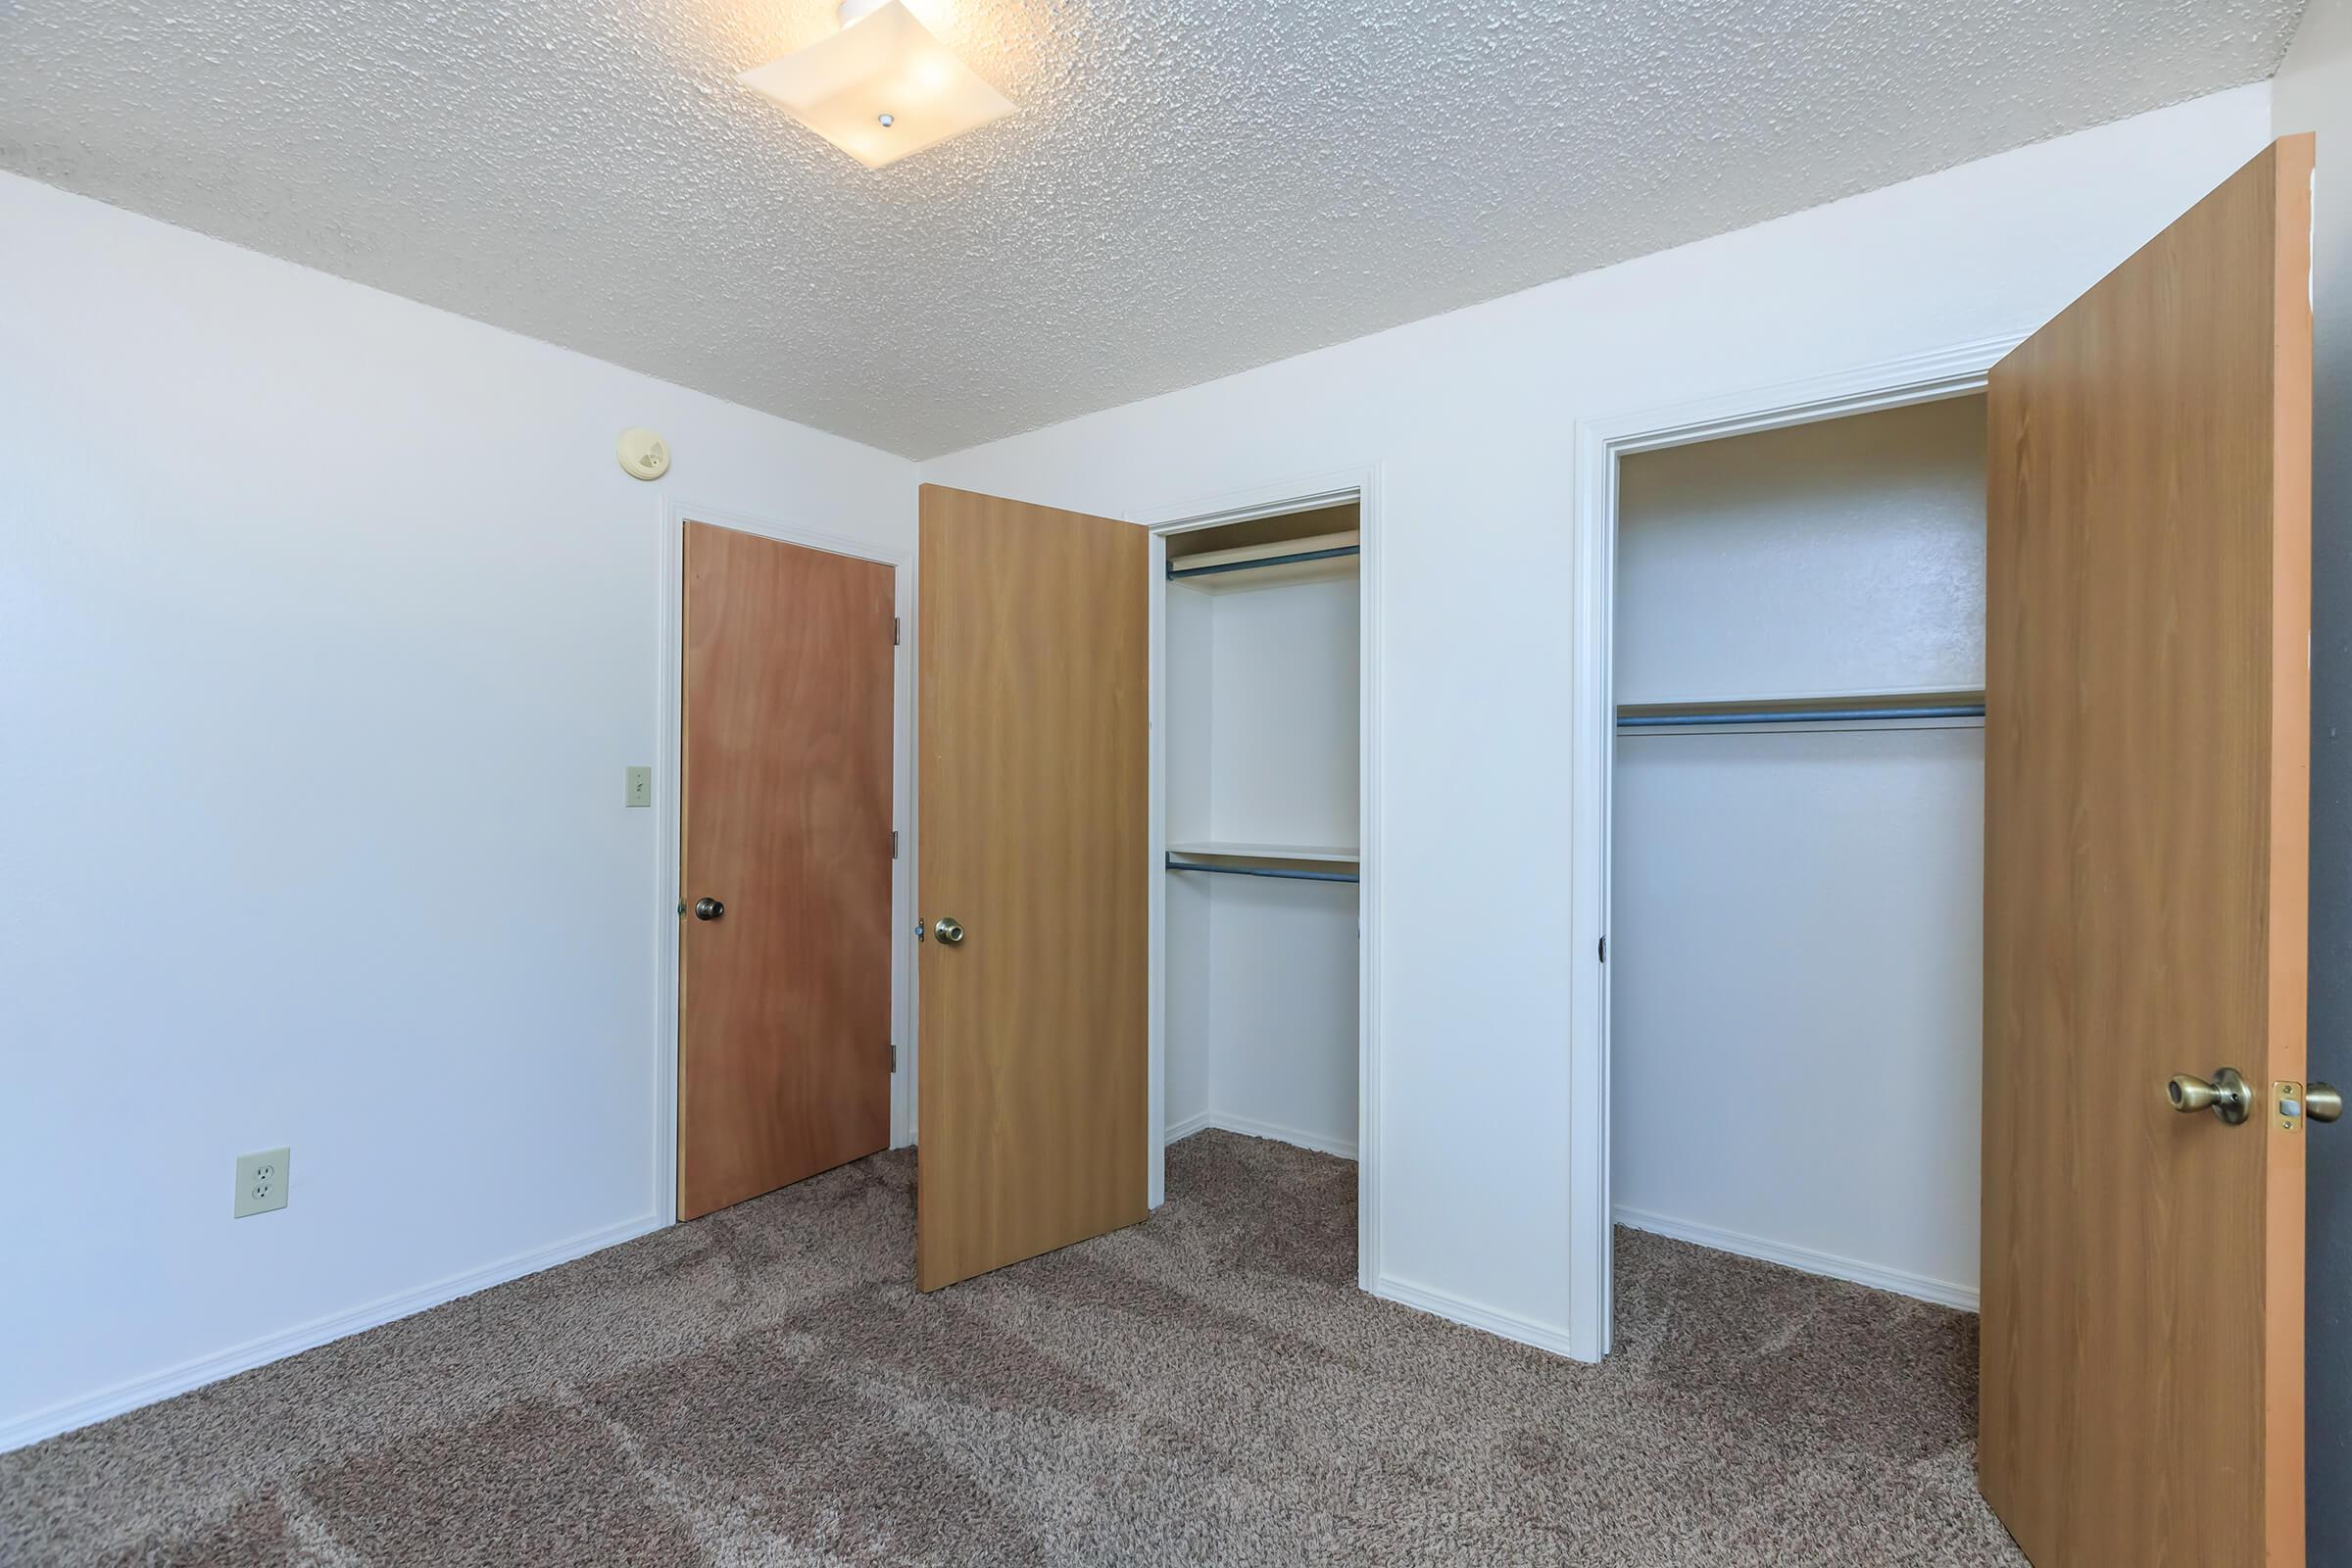 a room with a wooden door